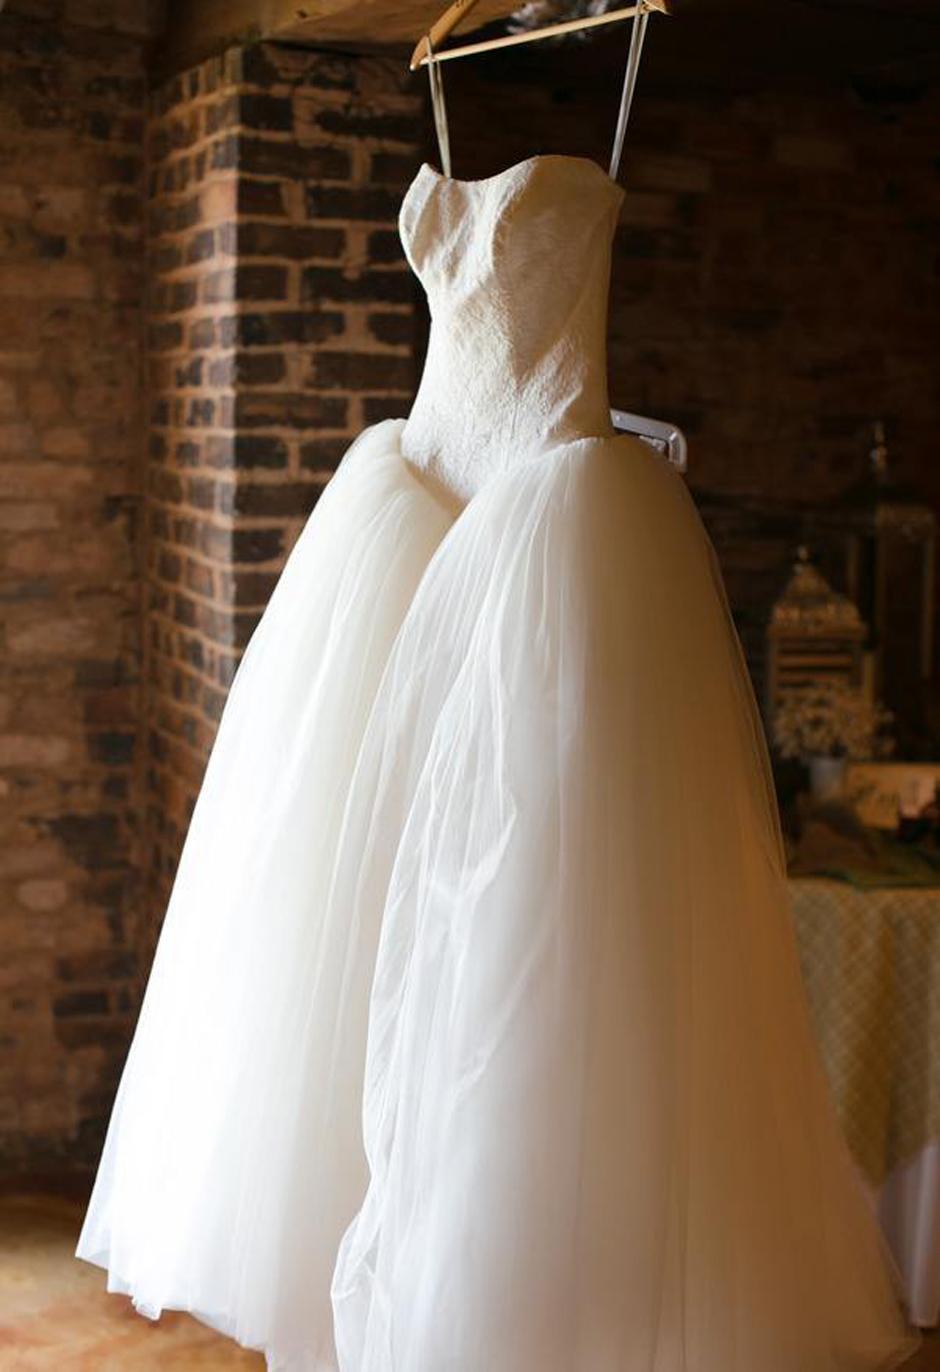 Wedding Gown Inspiration - Luxury Ball Gown - Professional Athlete Weddings - Oconee Events - Chiavari Chair Rental Athens, GA